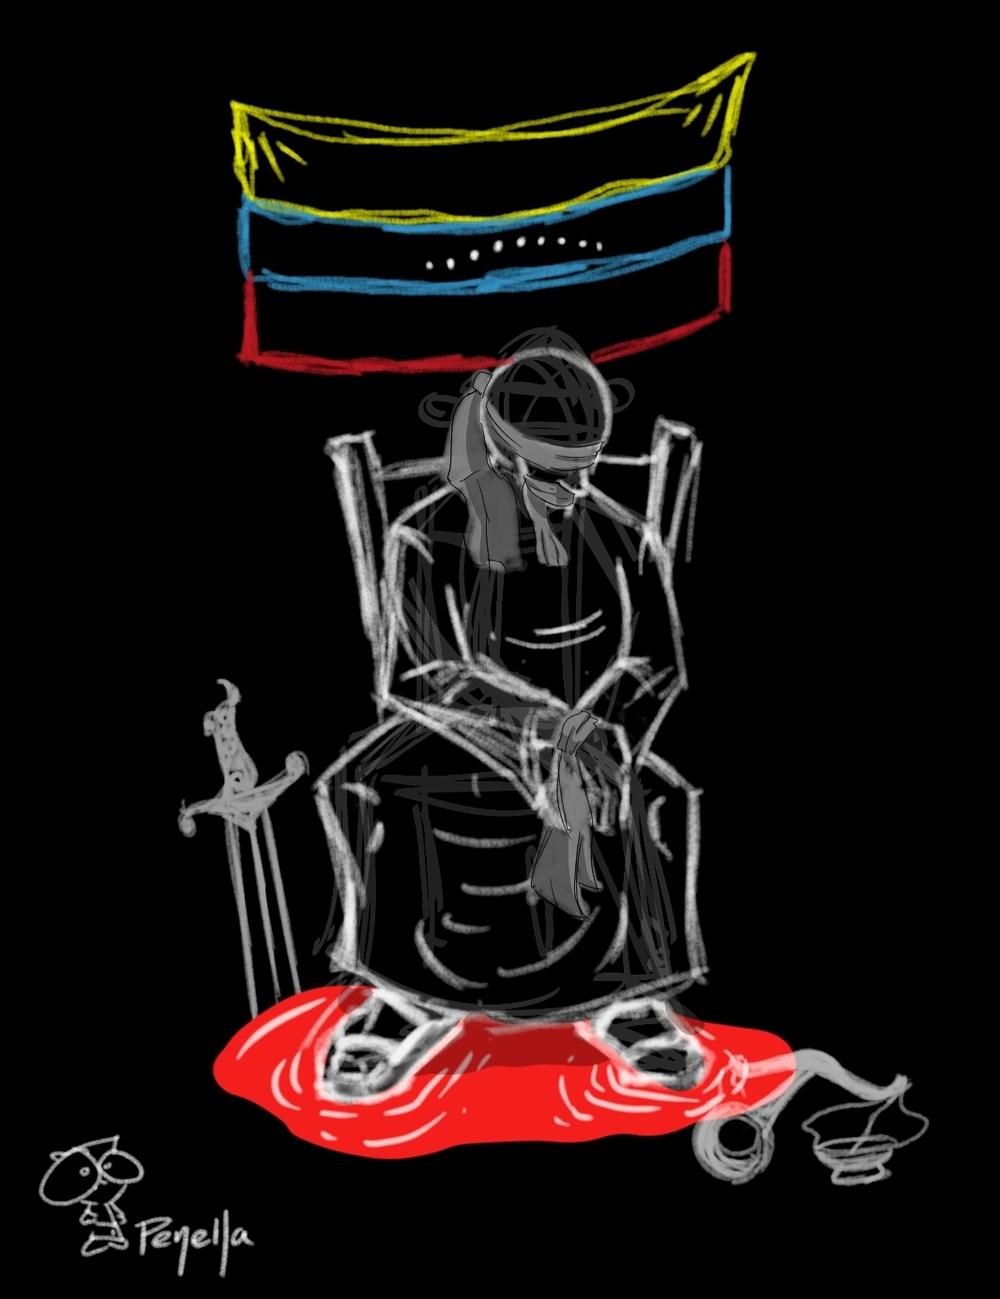 """Justice in Venezuela"" by Jesus Penella (IG:@penellacomics)"